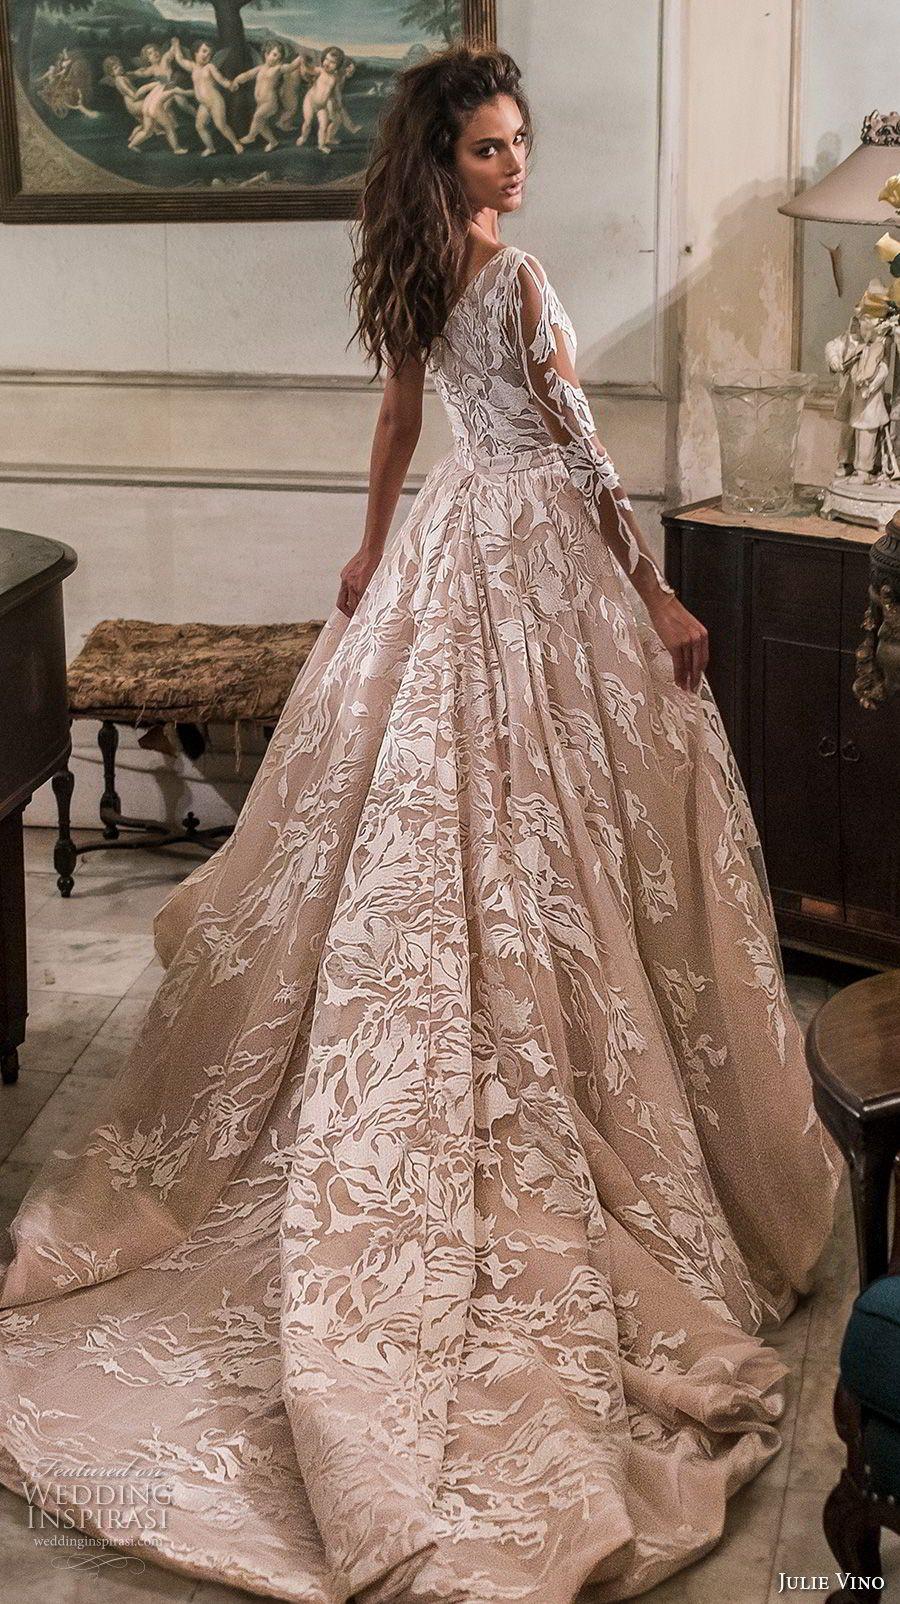 Julie Vino Fall 2018 Wedding Dresses Havana Bridal Collection Wedding Inspirasi Perfect Wedding Dress Christmas Wedding Dresses Bridal Couture [ 1604 x 900 Pixel ]